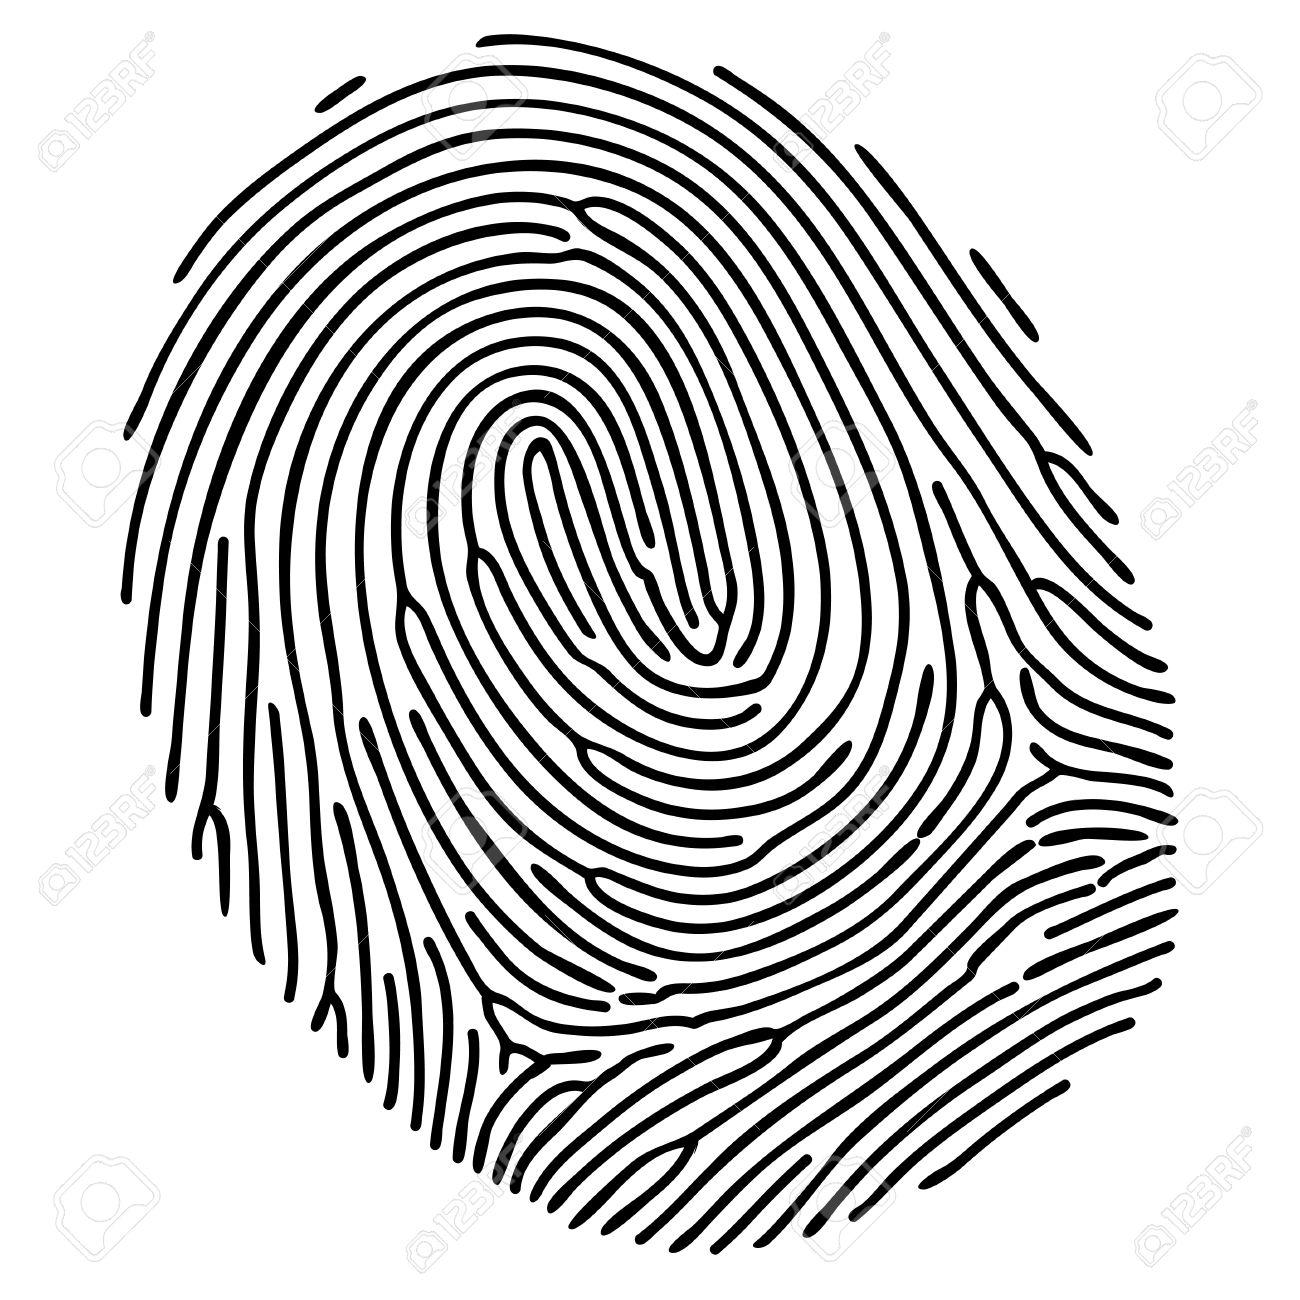 11,233 Fingerprint Stock Vector Illustration And Royalty Free ...